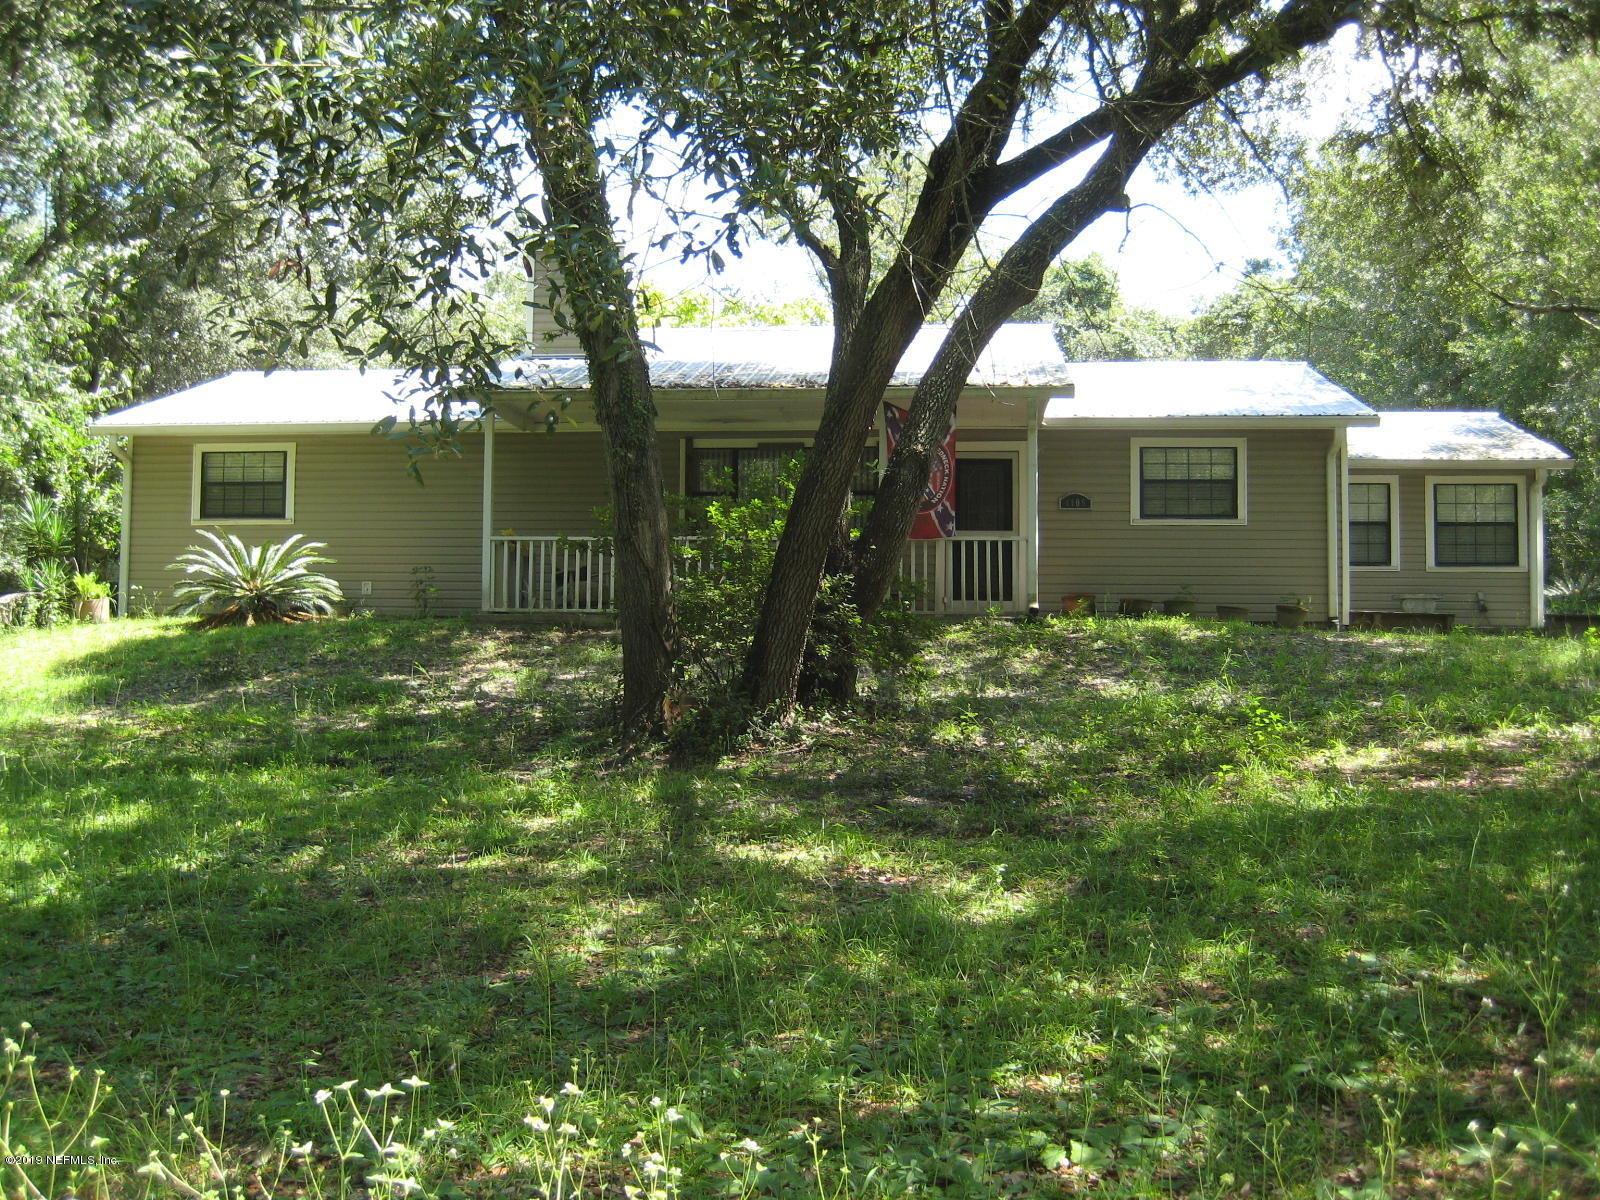 4400 TARRAGON, MIDDLEBURG, FLORIDA 32068, 4 Bedrooms Bedrooms, ,2 BathroomsBathrooms,Residential - single family,For sale,TARRAGON,985189